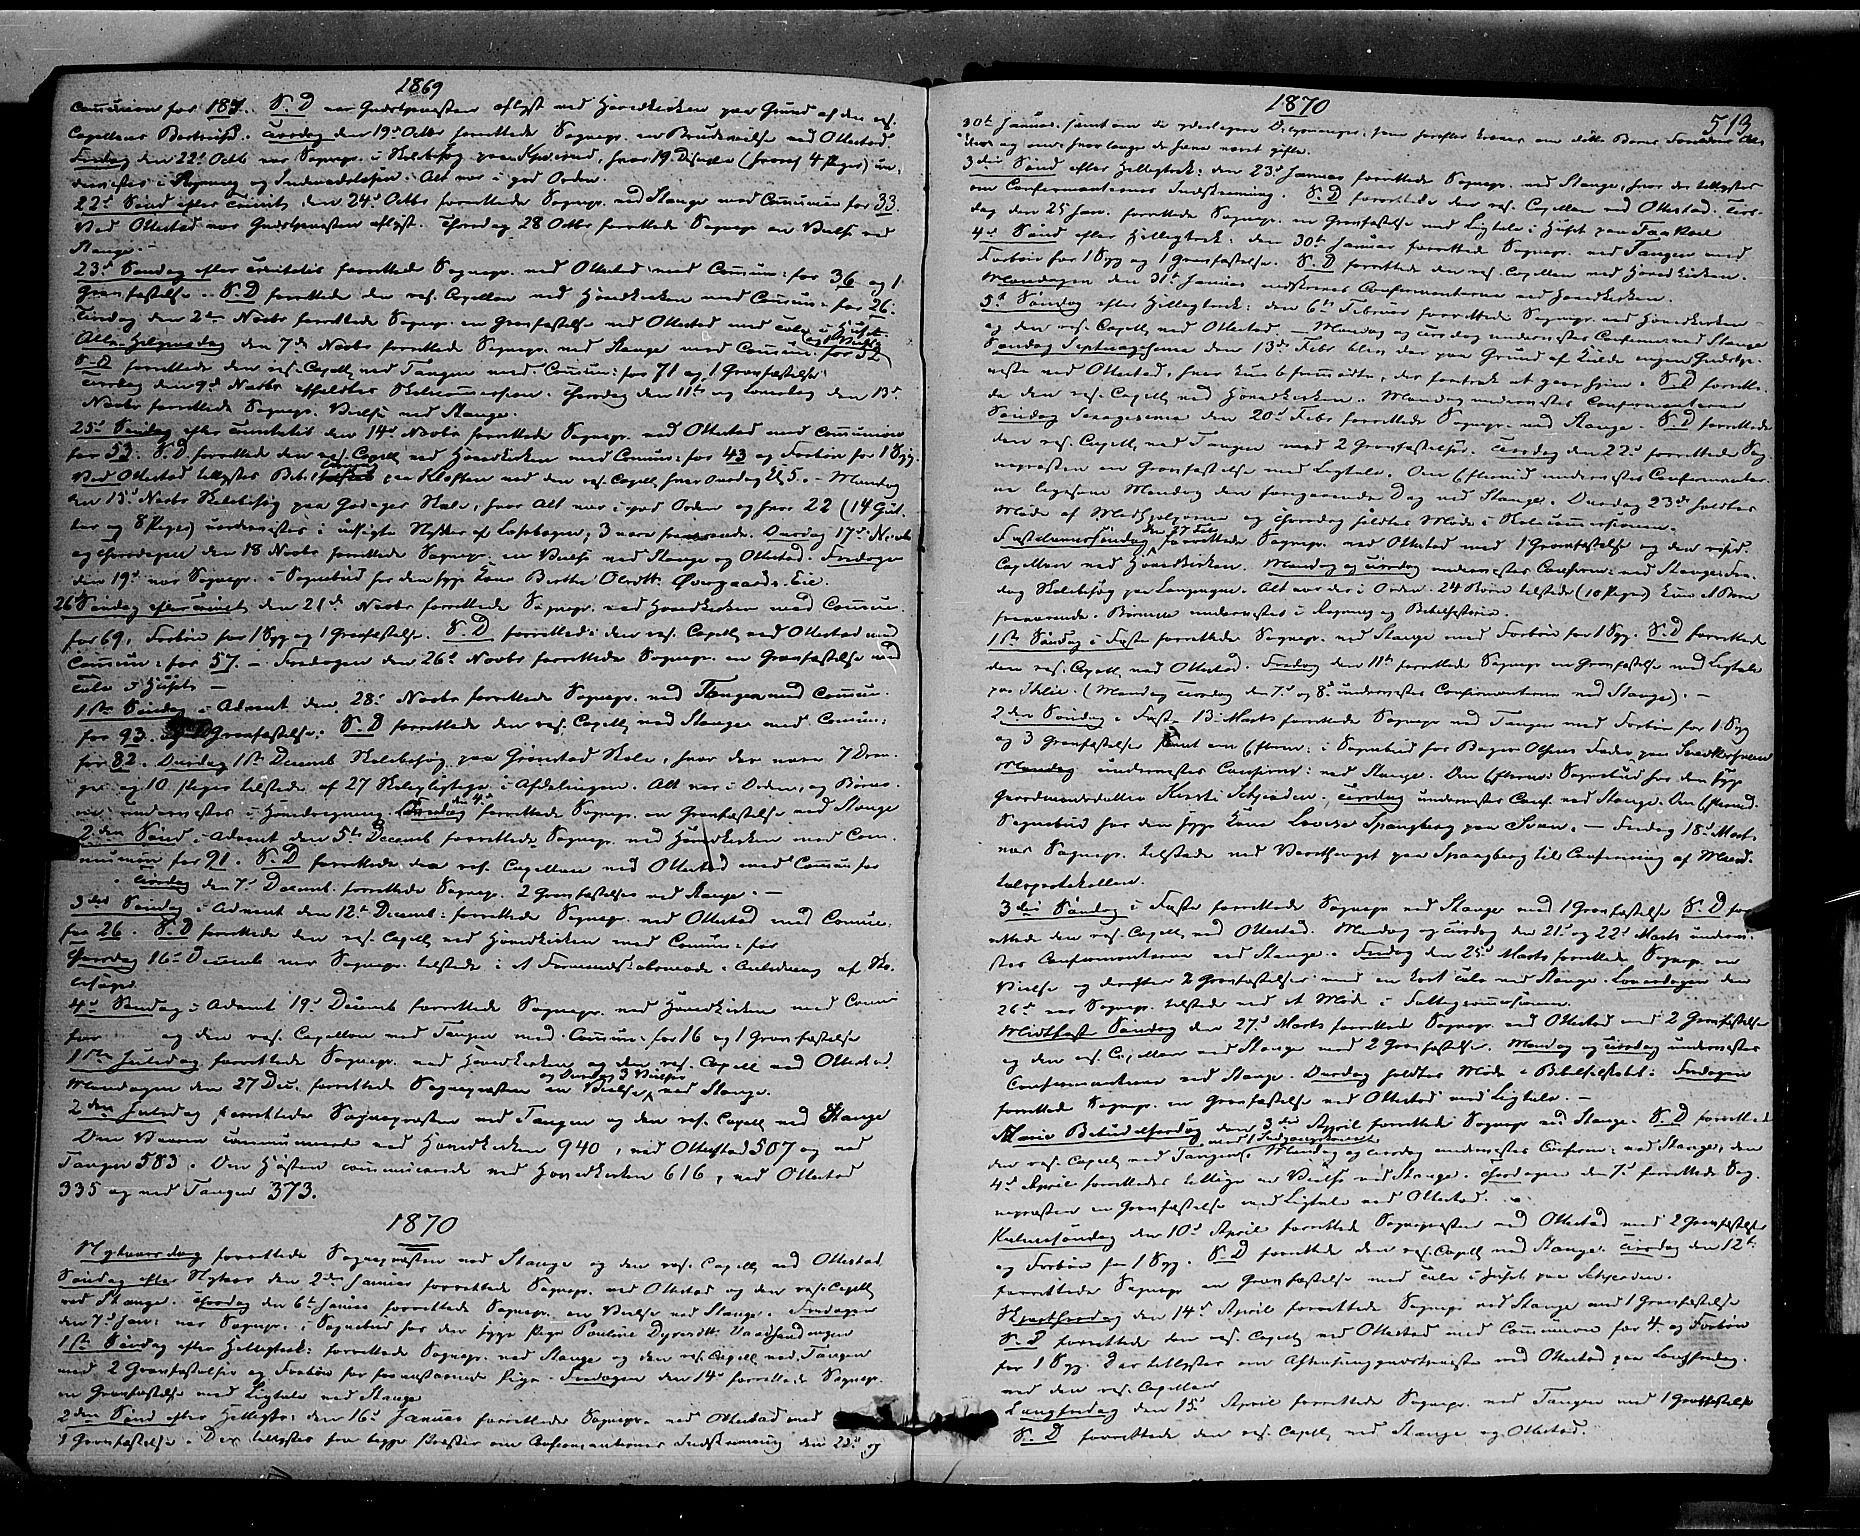 SAH, Stange prestekontor, K/L0013: Ministerialbok nr. 13, 1862-1879, s. 513